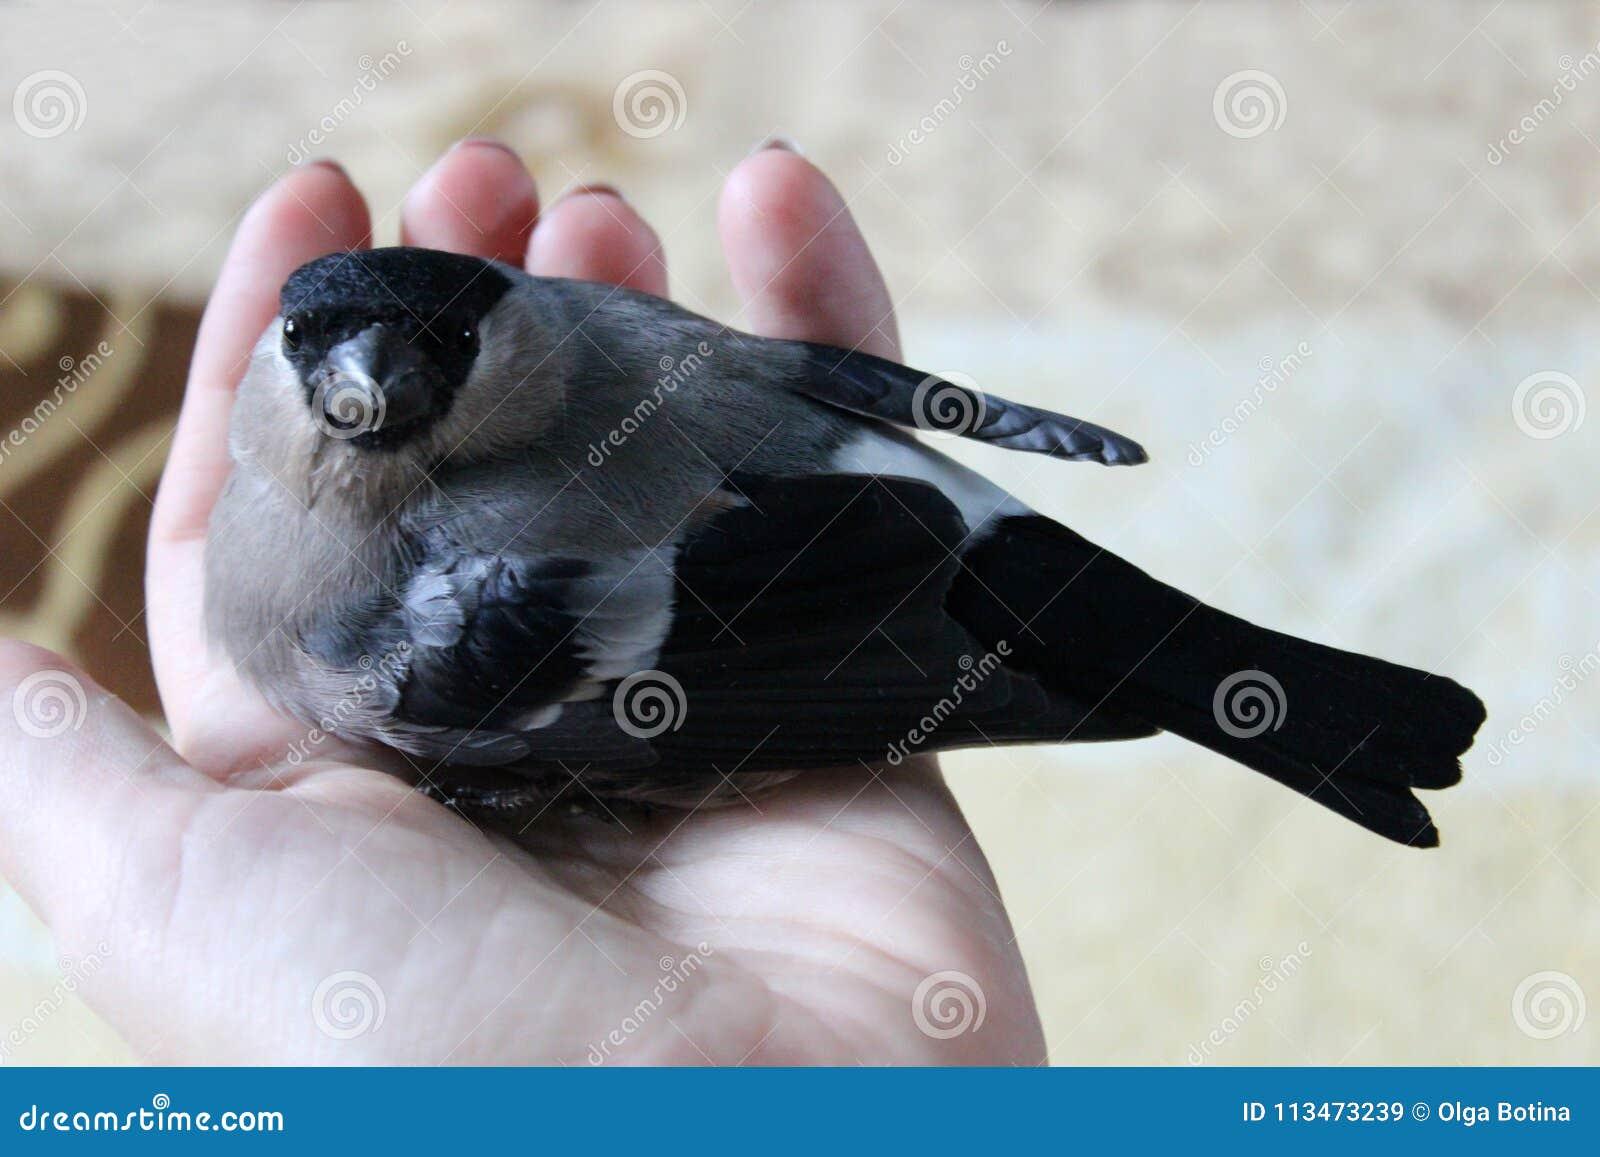 Ptasi gil na ręce